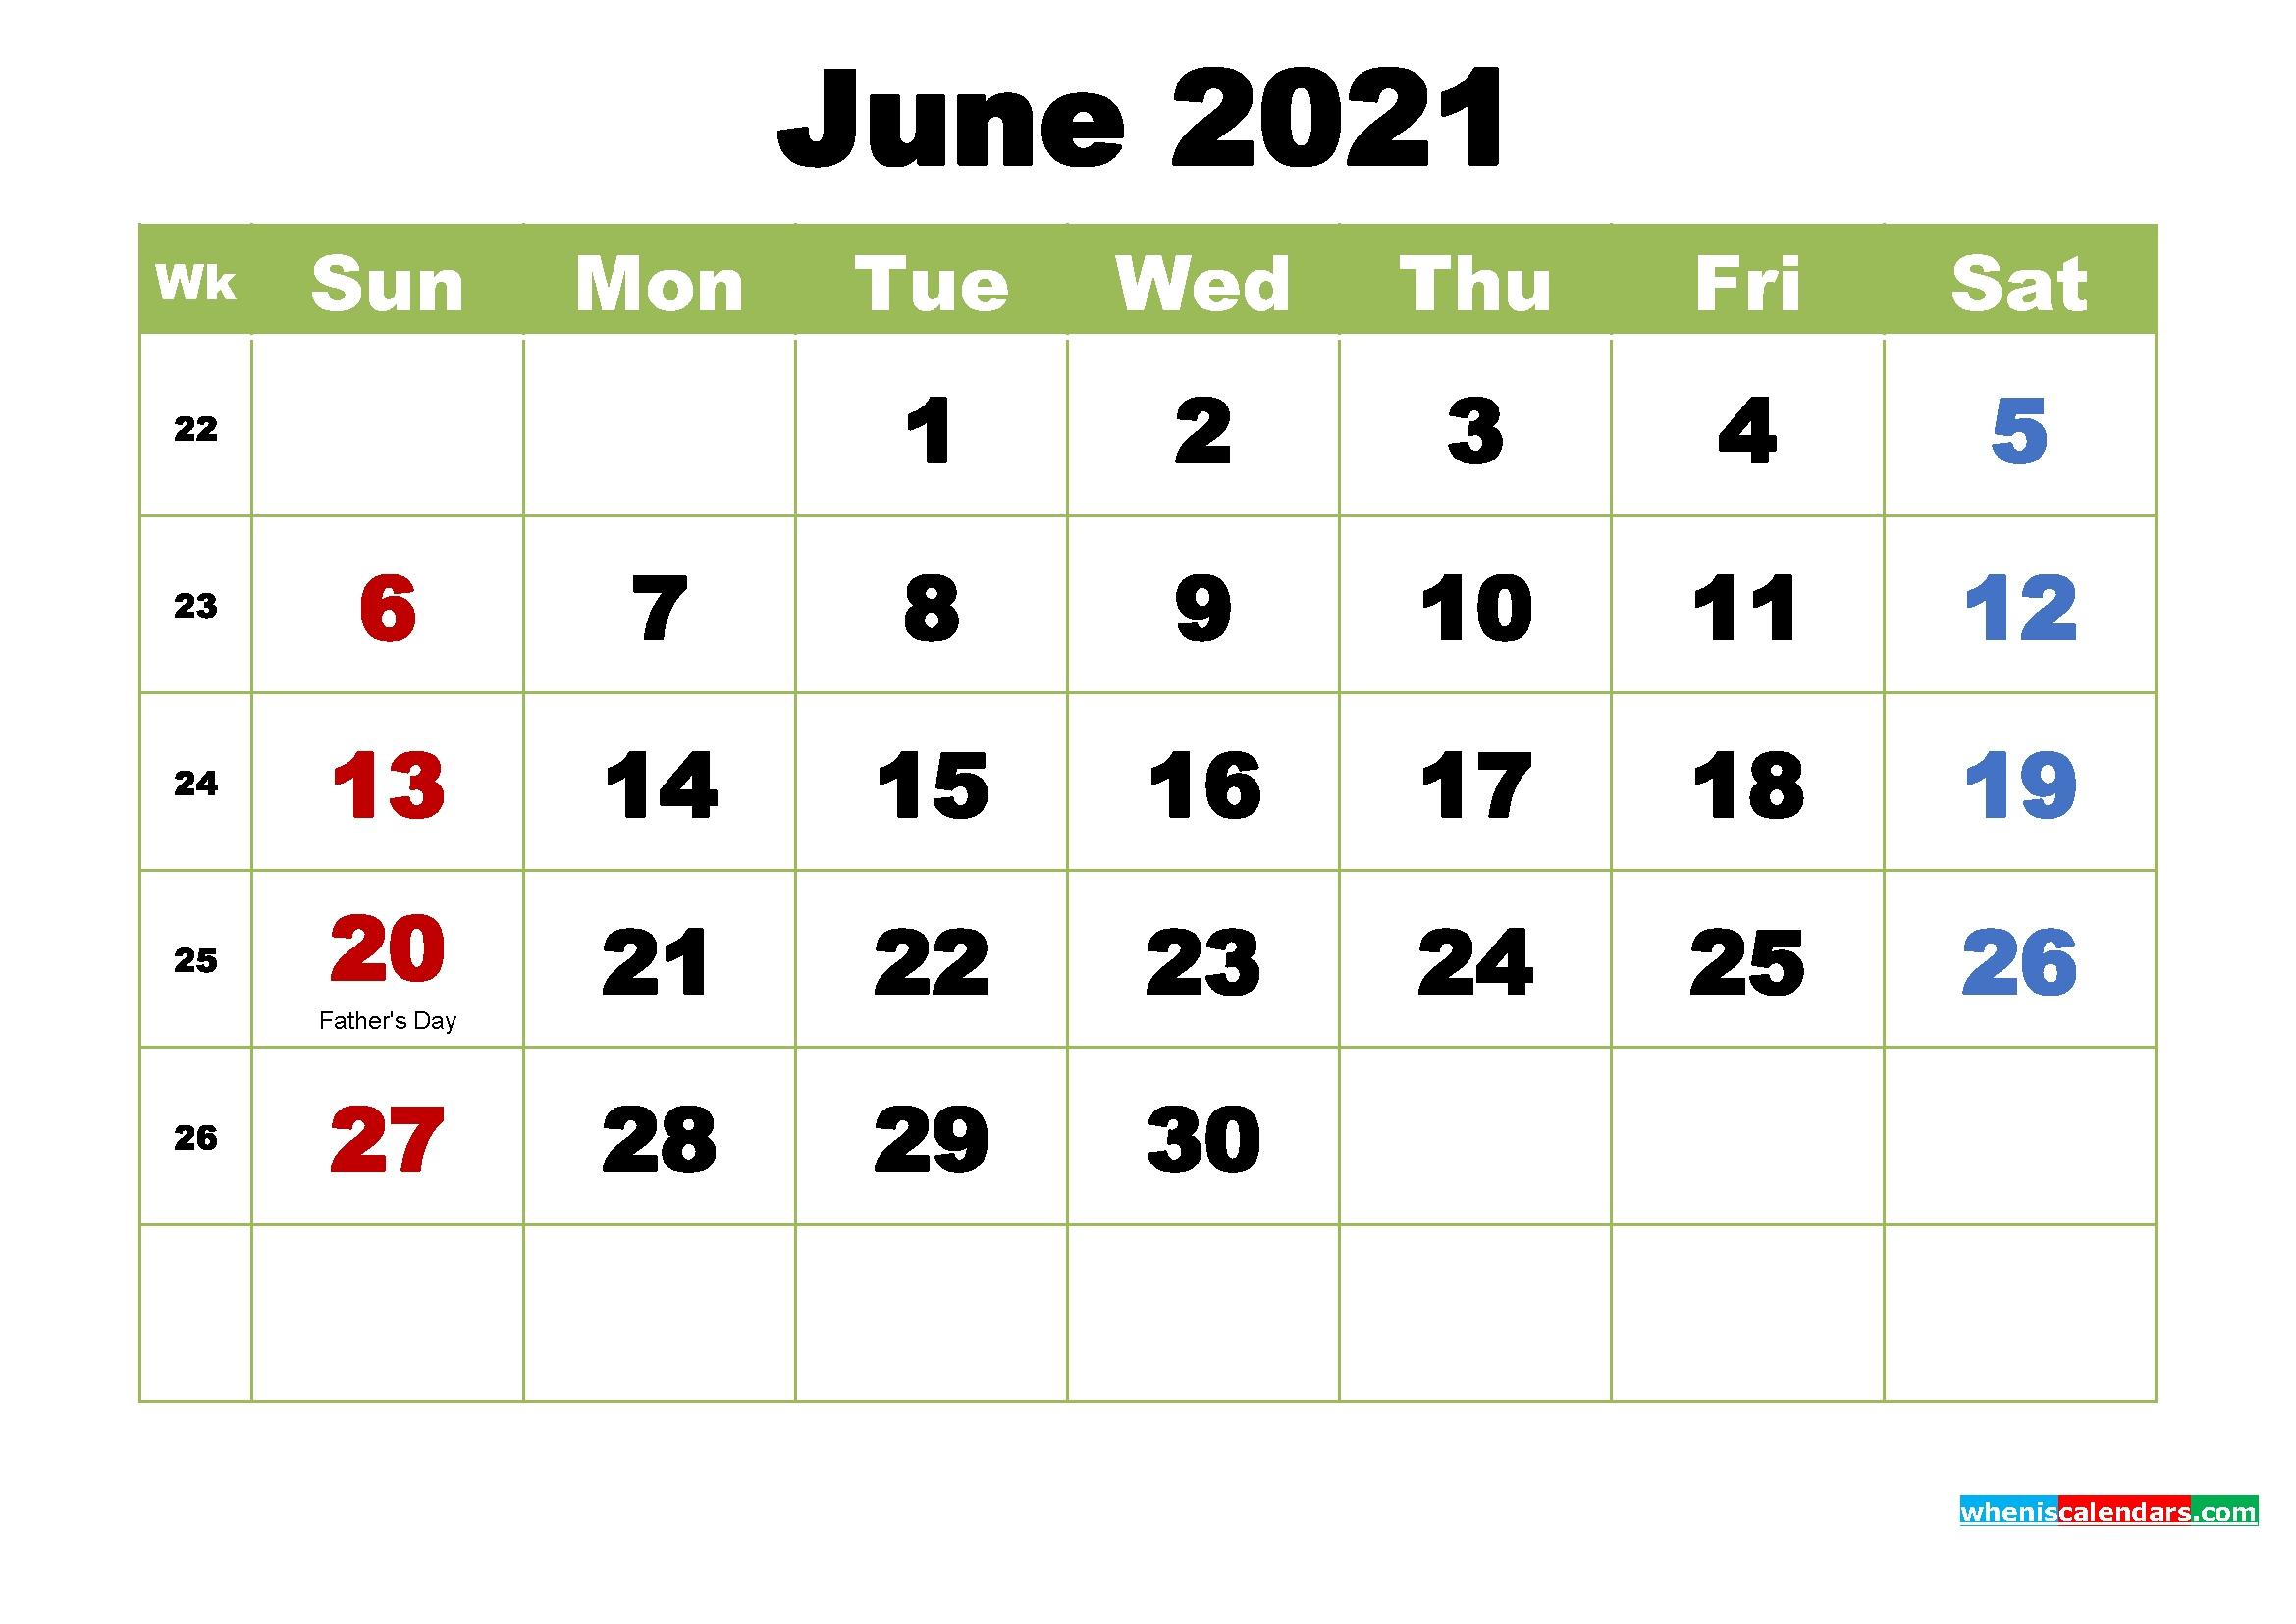 Free June 2021 Printable Calendar With Holidays June 2021 Calendar Printable